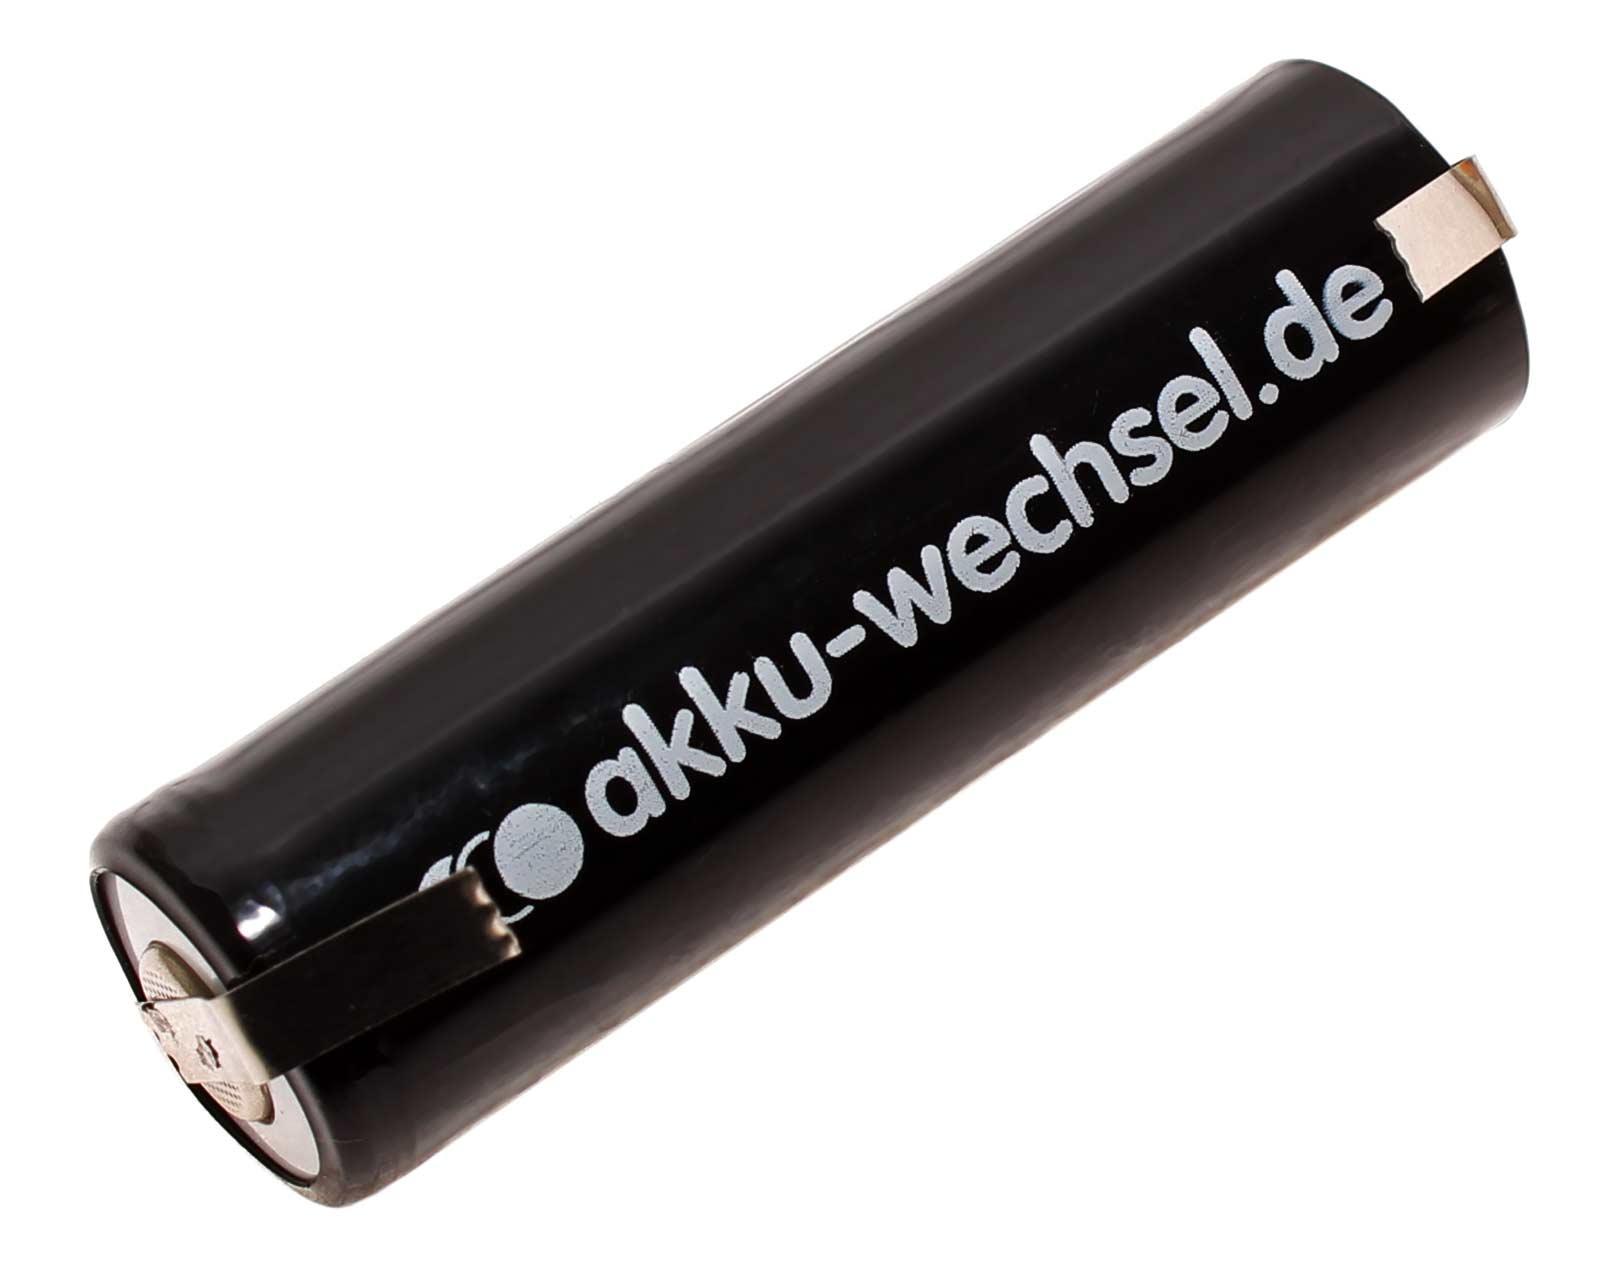 Philips Braun Grundig Accu Rasierer Akku Ersatzakku 2,4V NiMH Battery Batterie